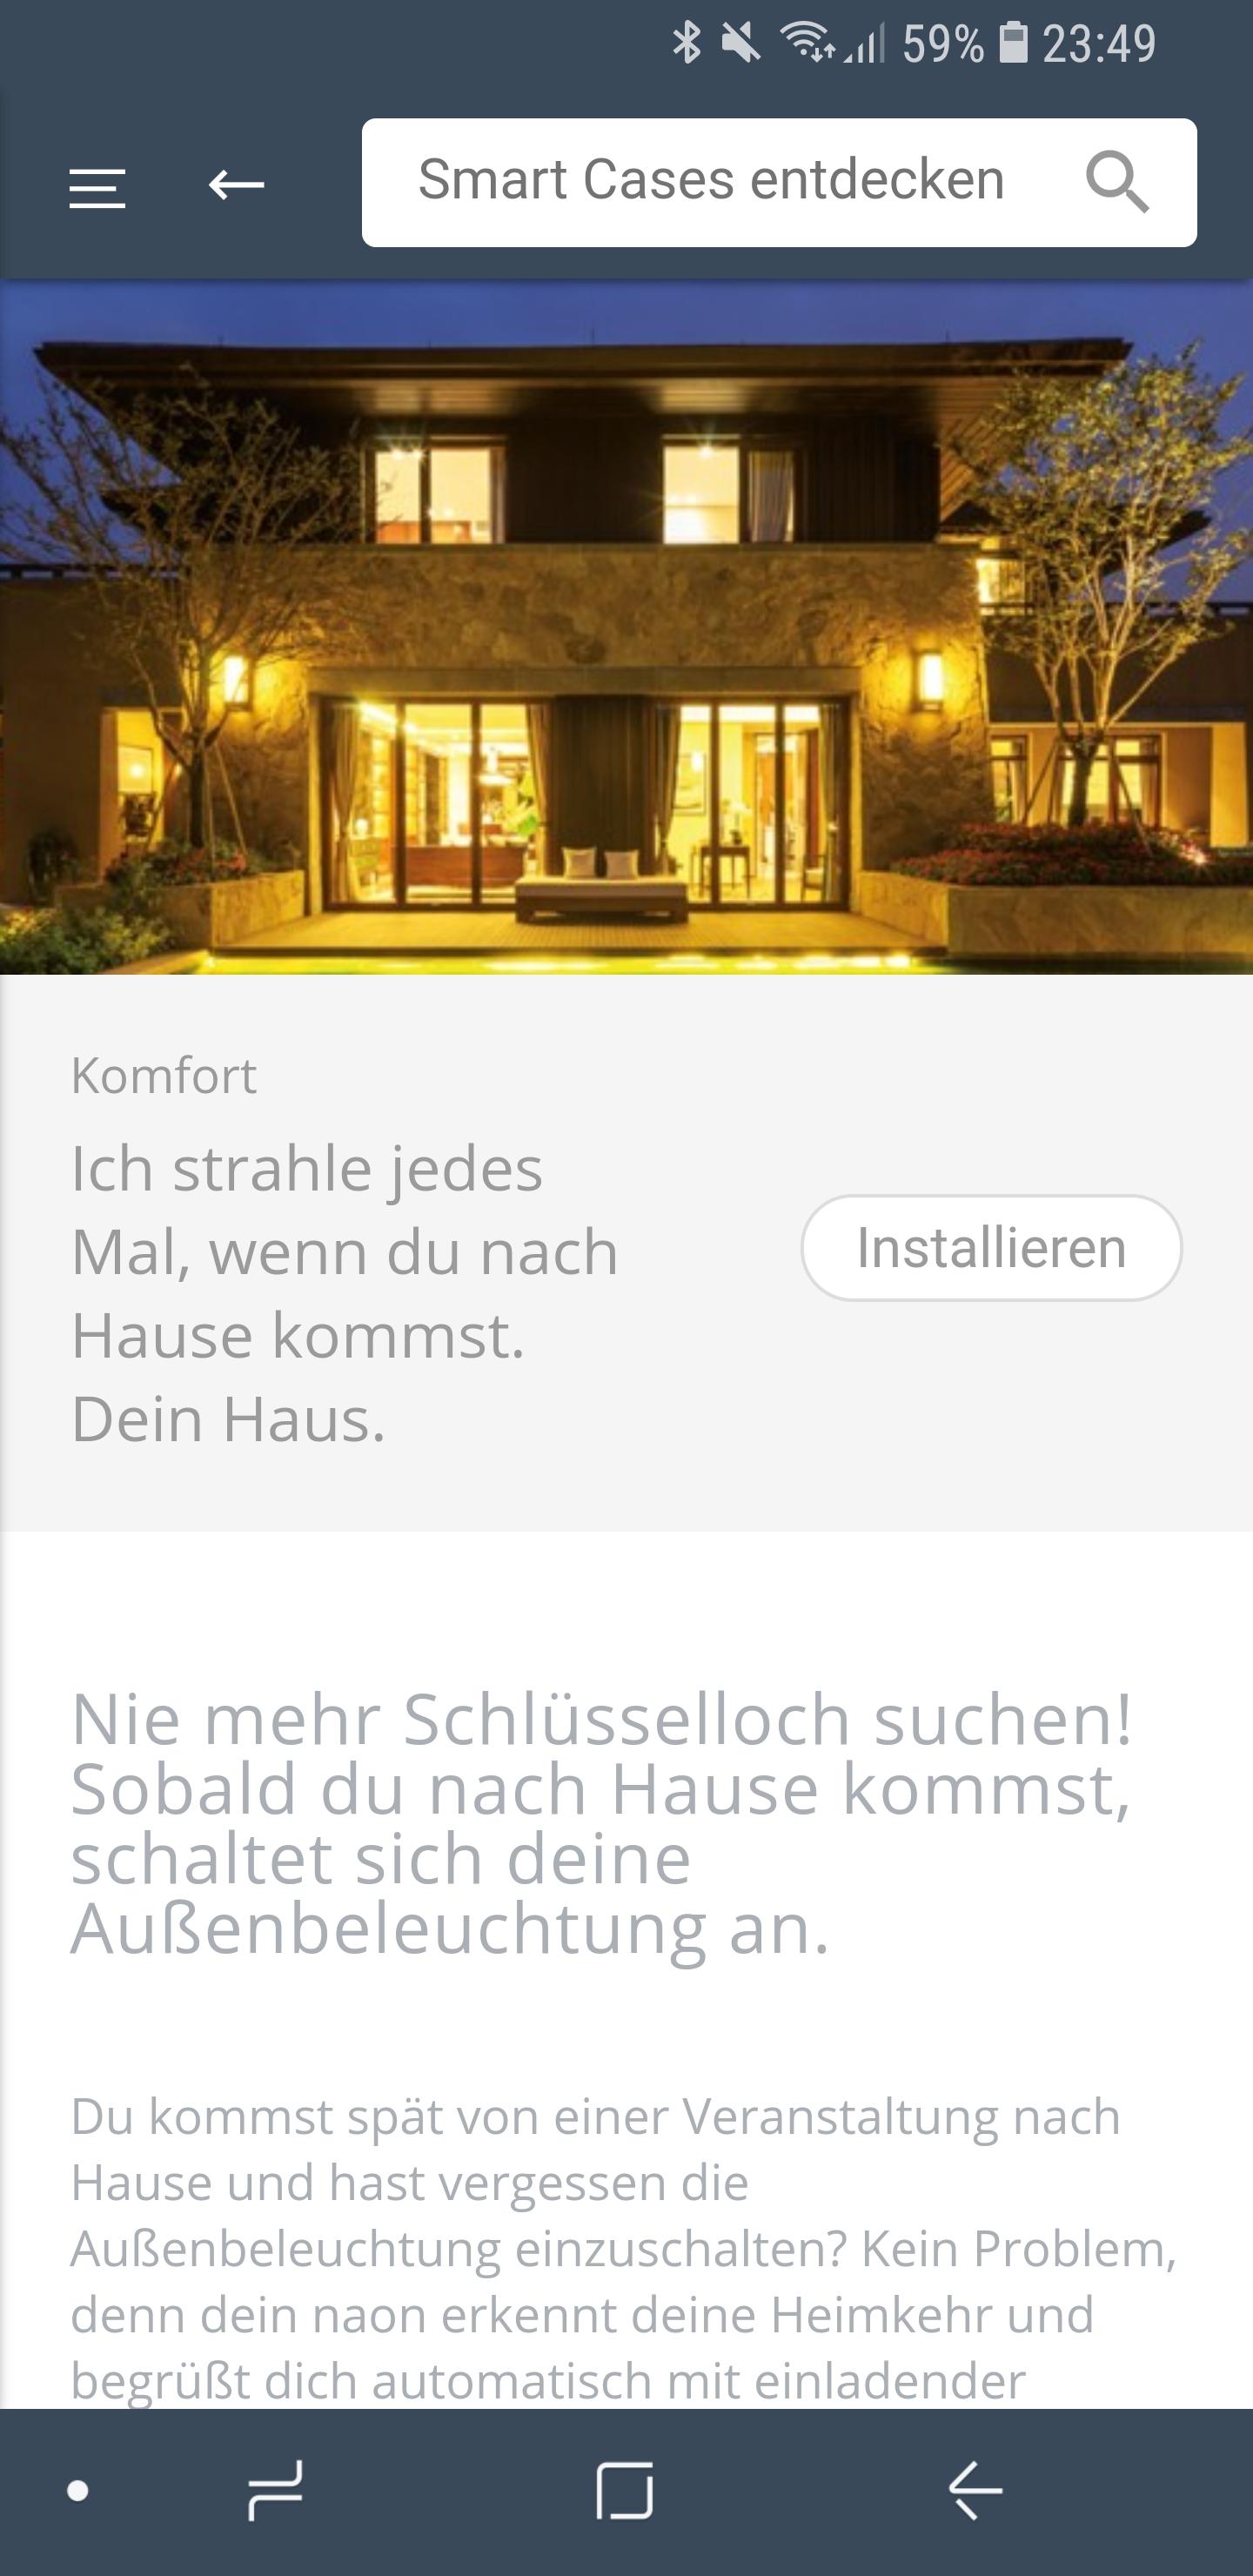 naon Bogen App Smartcase hinzufügen 02